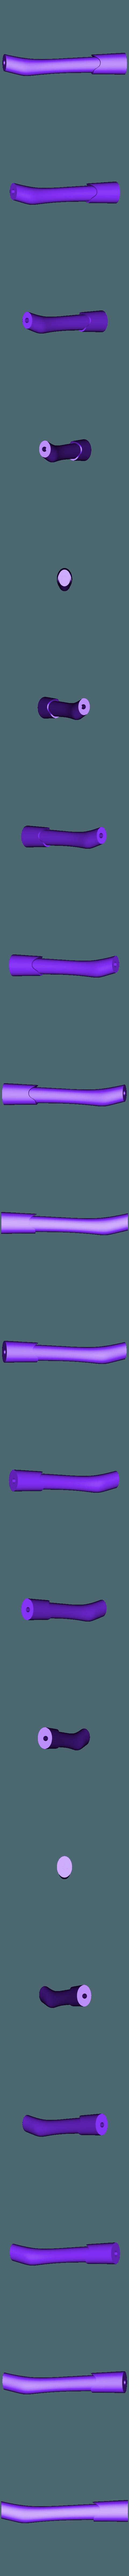 handle2.stl Download STL file Fortnite's axe! / Fortnite Axe! • 3D print design, MLBdesign